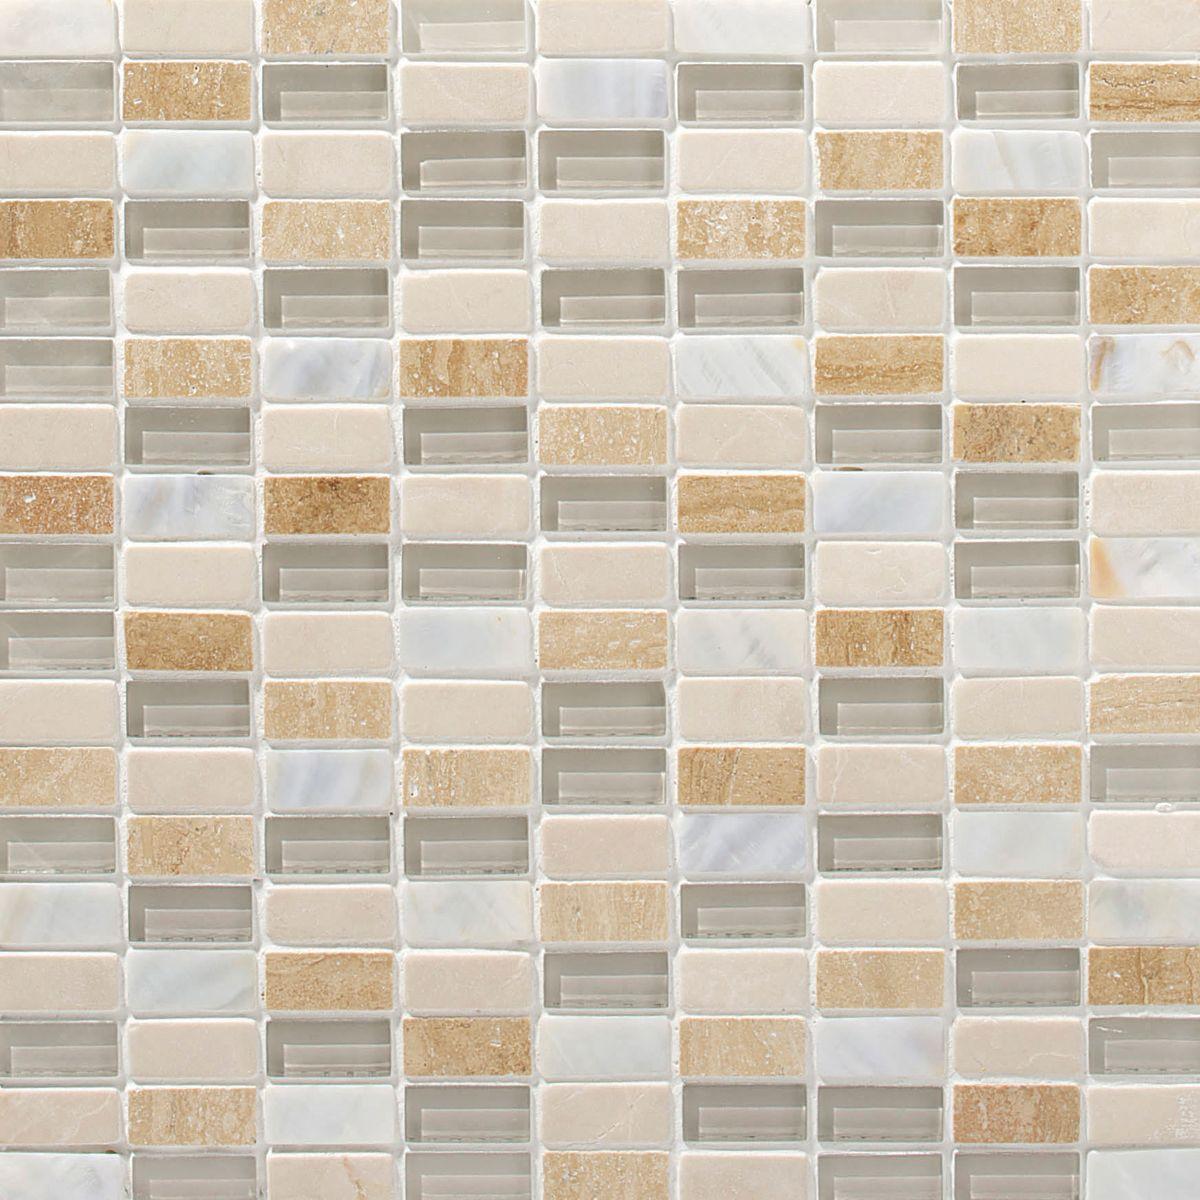 Leroy merlin mosaico piastrelle mosaico bagno leroy - Piastrelle mosaico leroy merlin ...